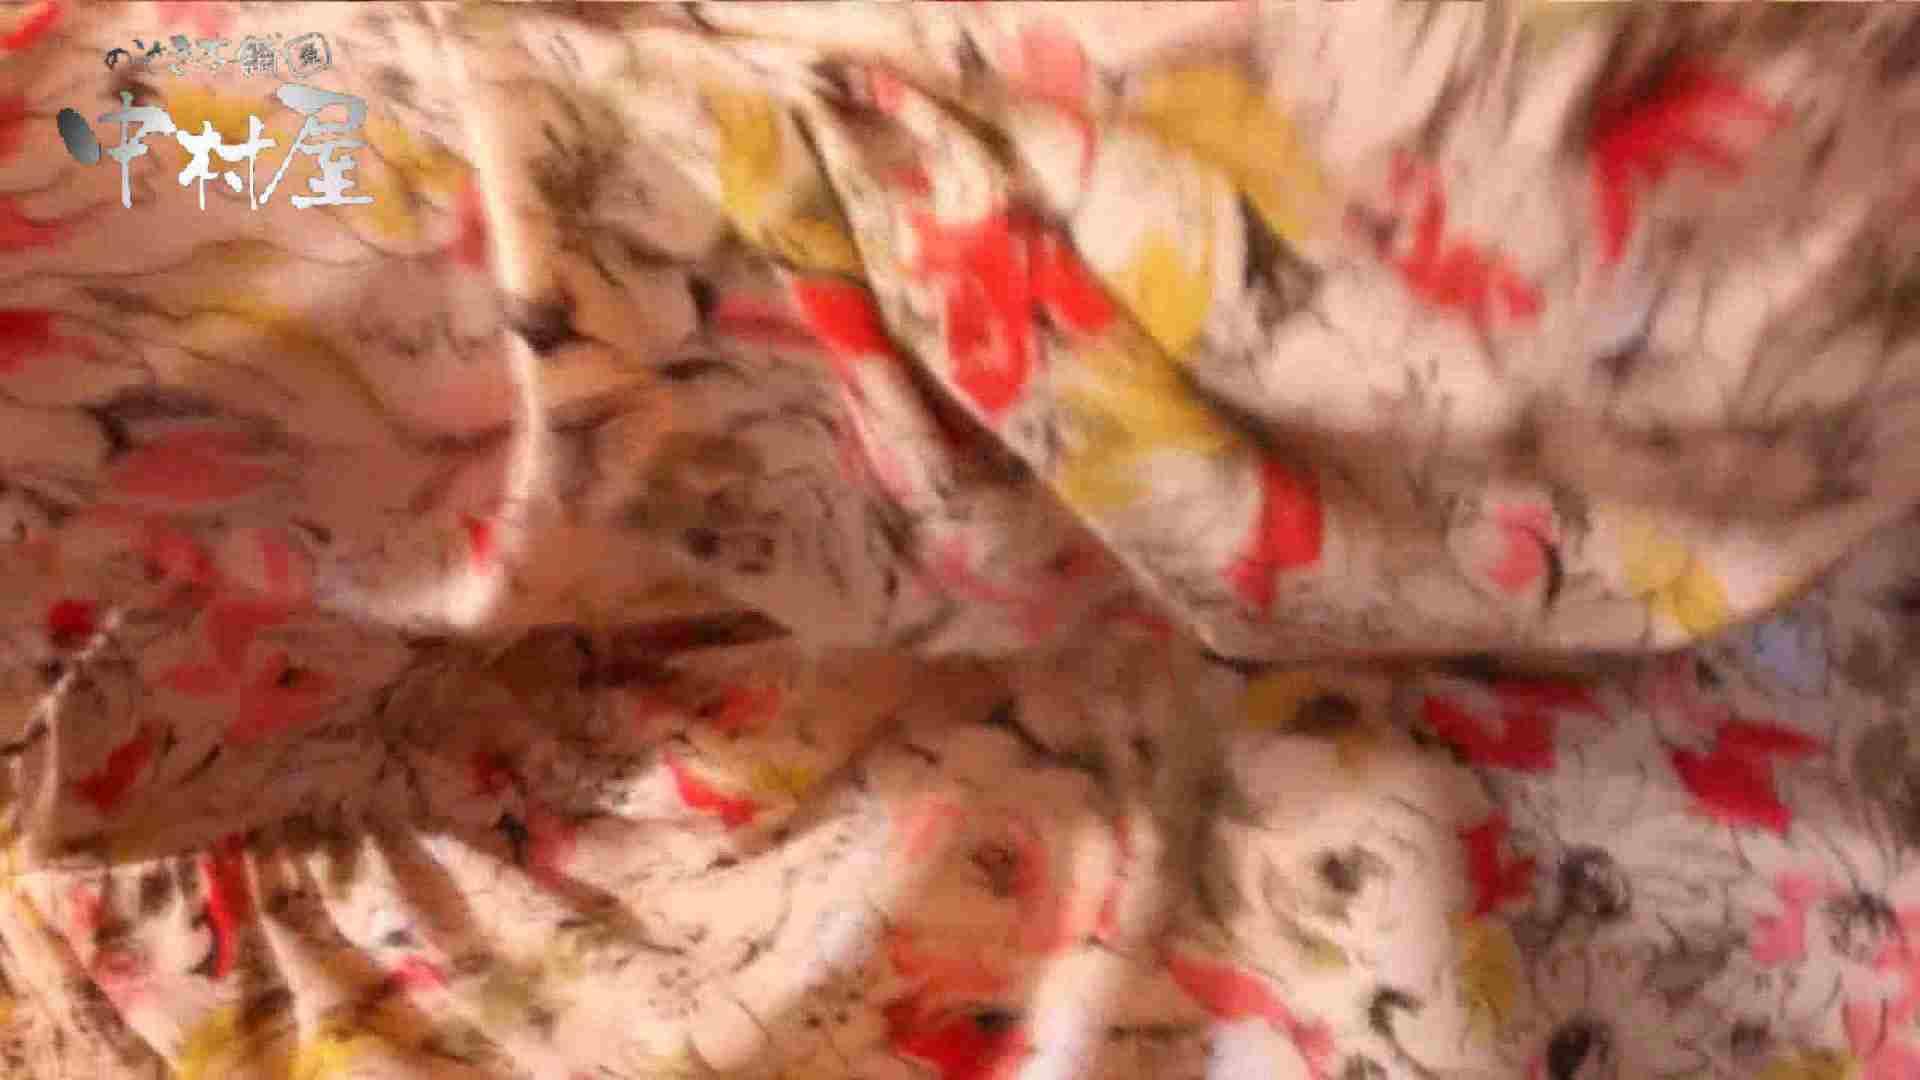 vol.57 美人アパレル胸チラ&パンチラ 激カワ店員のおっぱい チラ ワレメ無修正動画無料 67枚 8